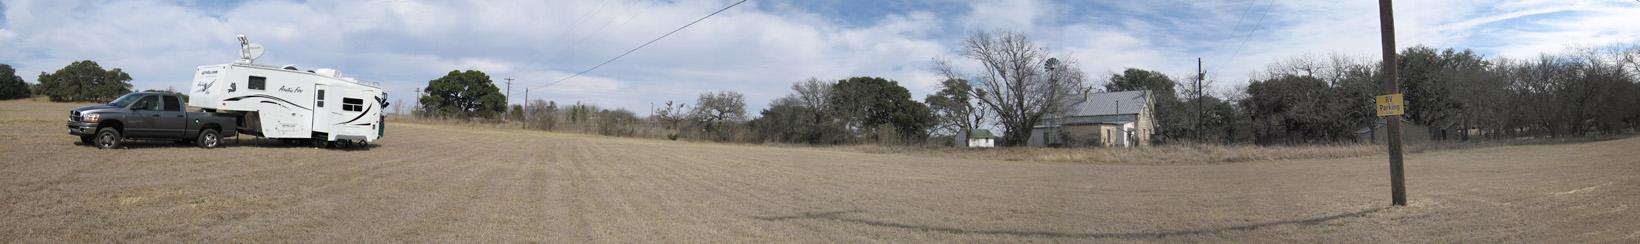 Boondocking in Luckenbach, TX